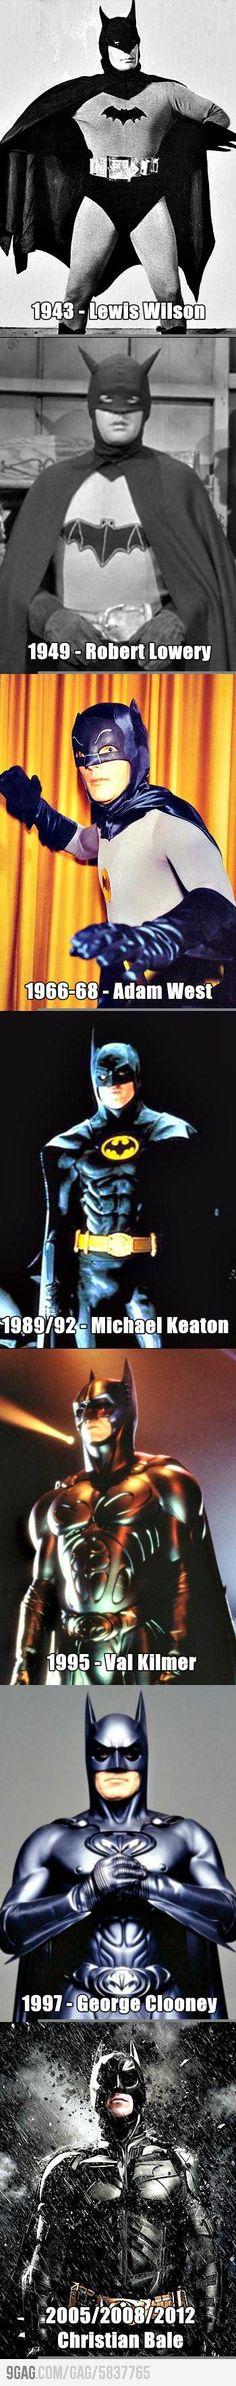 Evolution Of The Dark Knight.